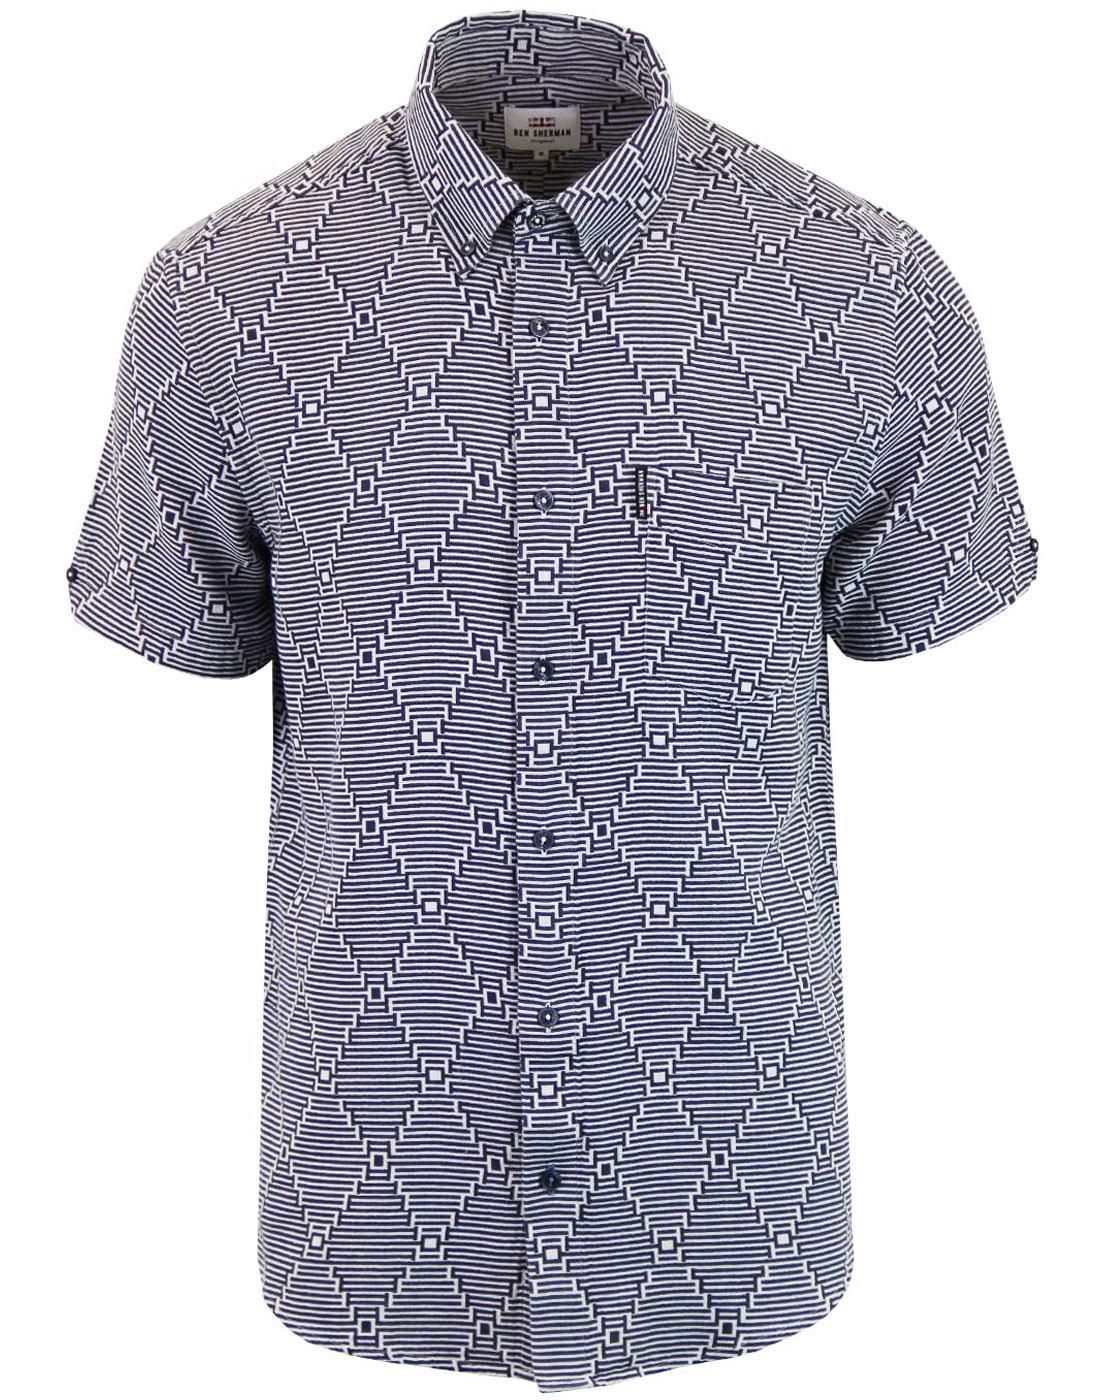 BEN SHERMAN Mens Mod Warp Stripe Op Art Shirt NAVY